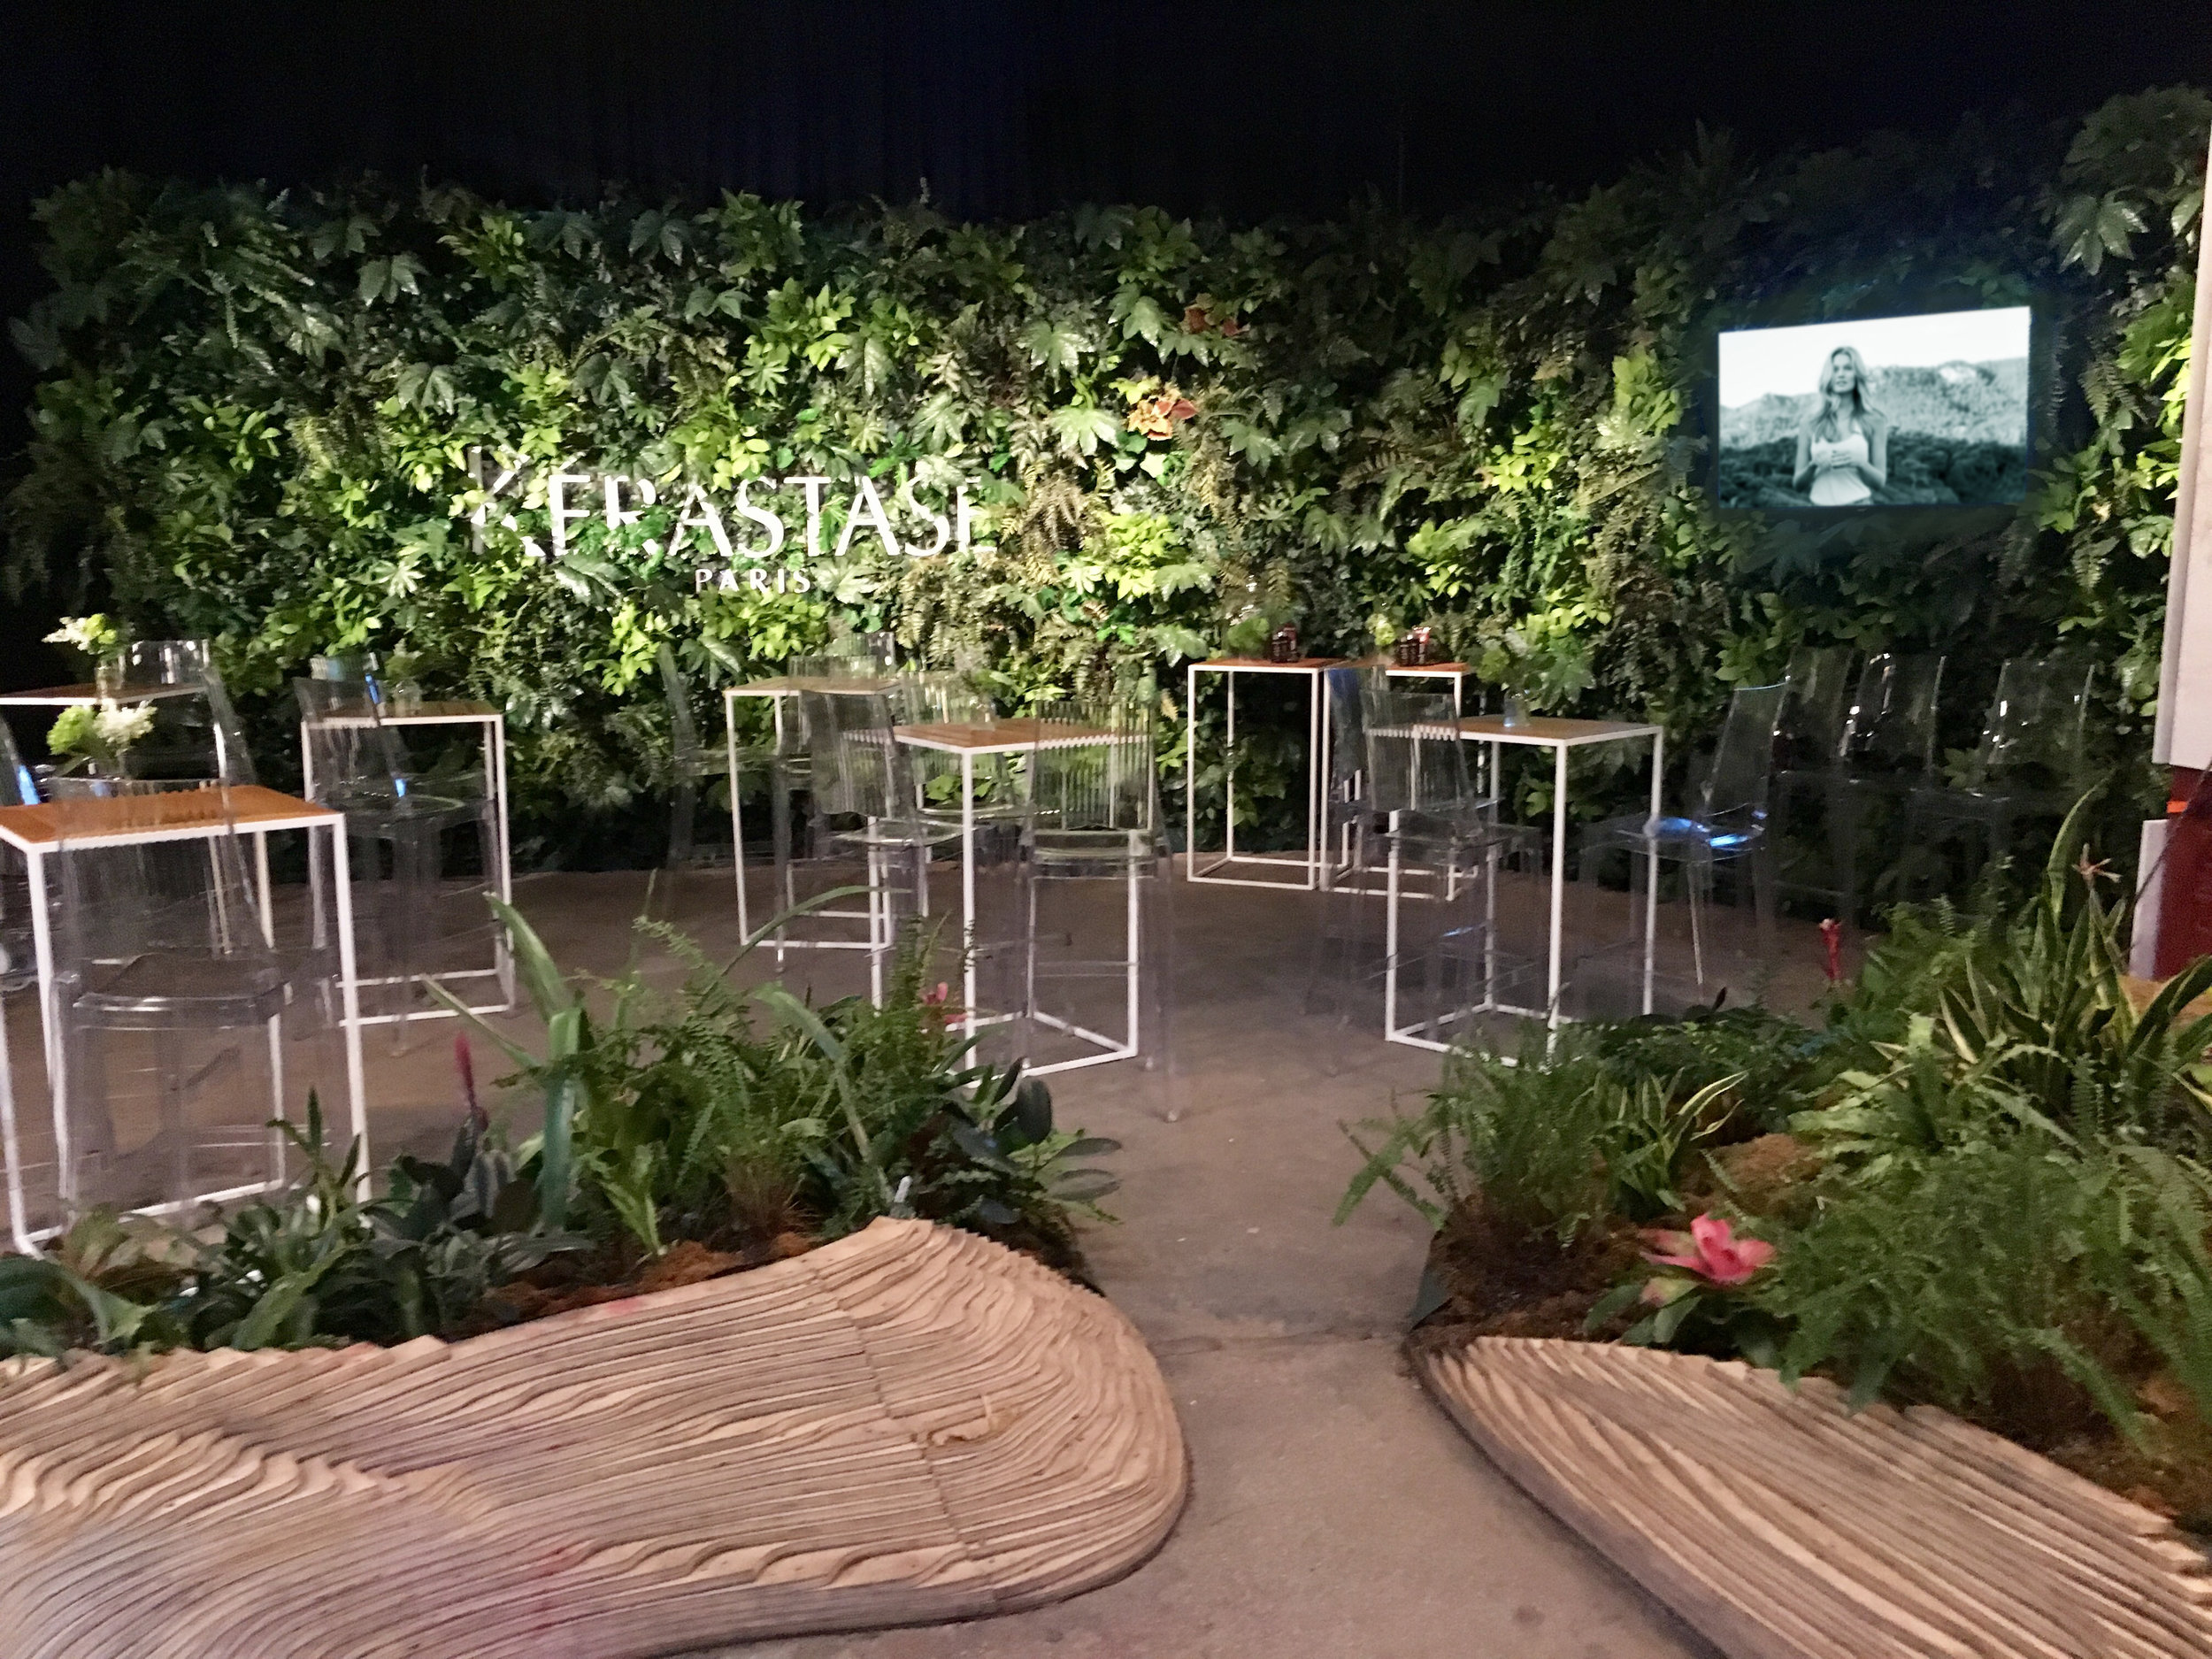 Kérastase Aura Botanica Launch